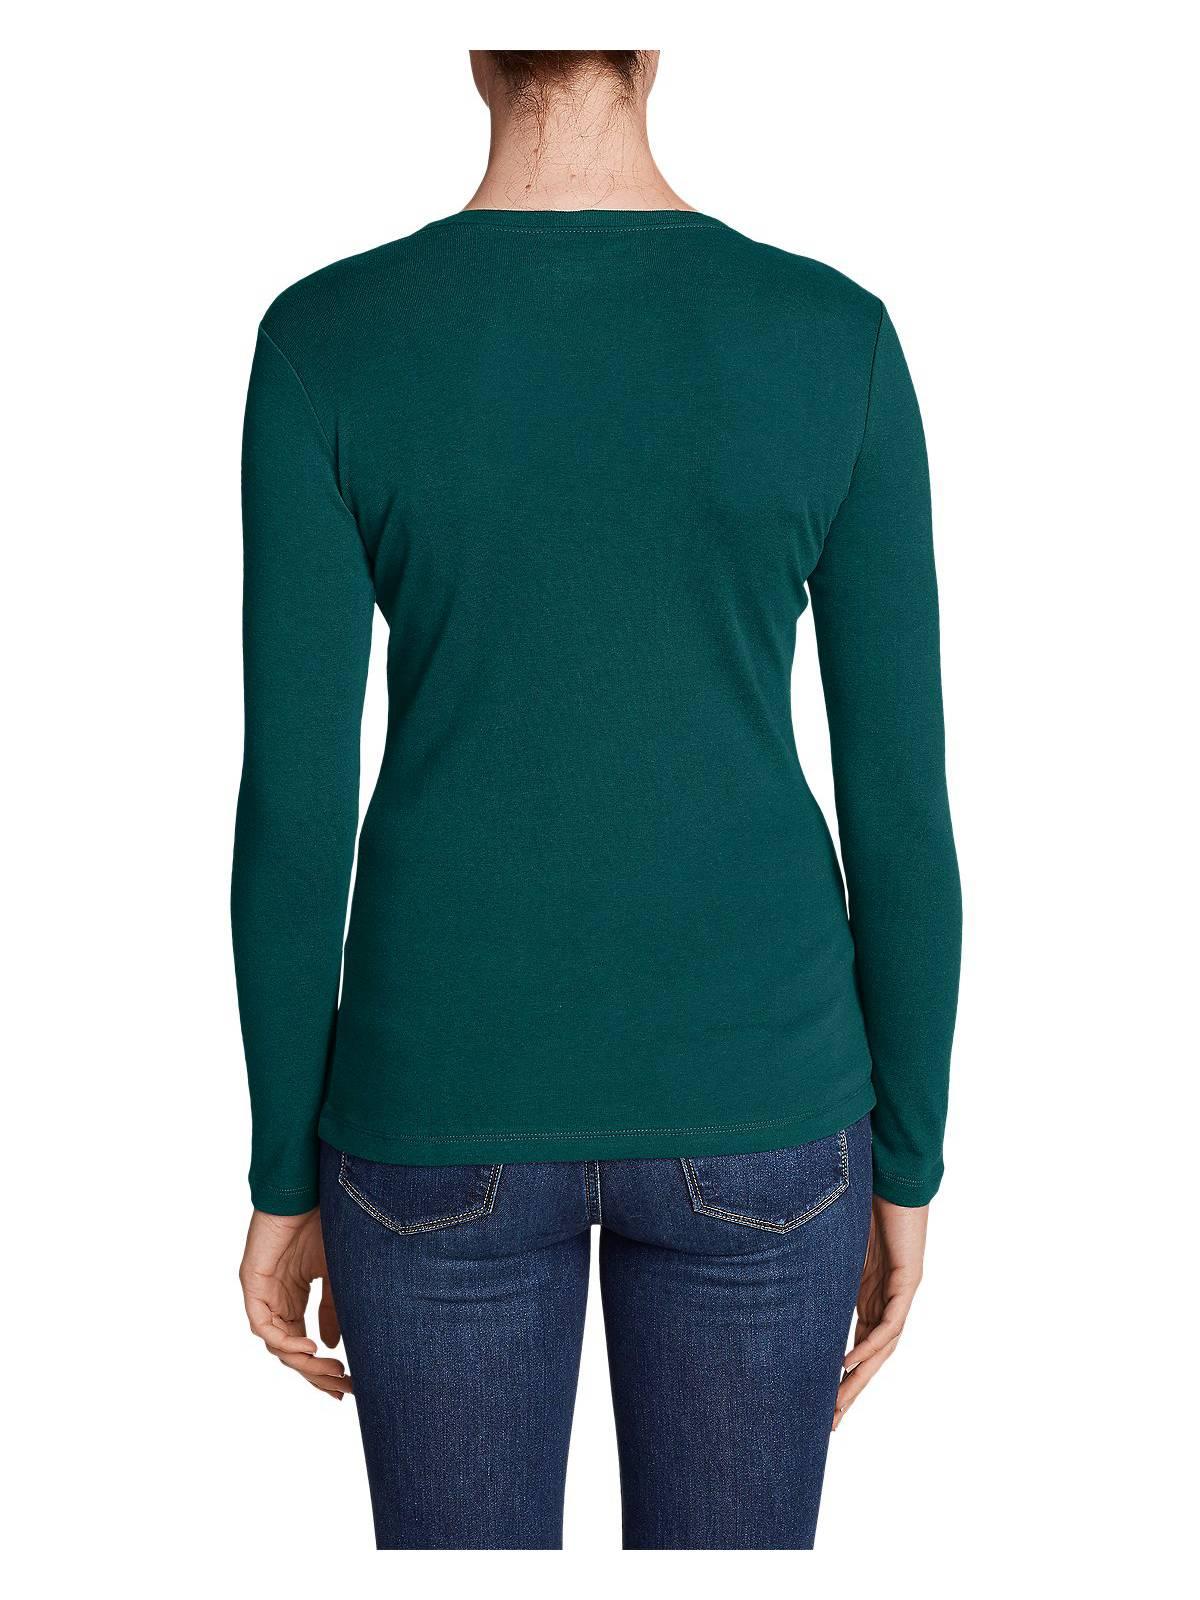 Eddie-Bauer-Women-039-s-Favorite-Long-Sleeve-Crewneck-T-Shirt thumbnail 36